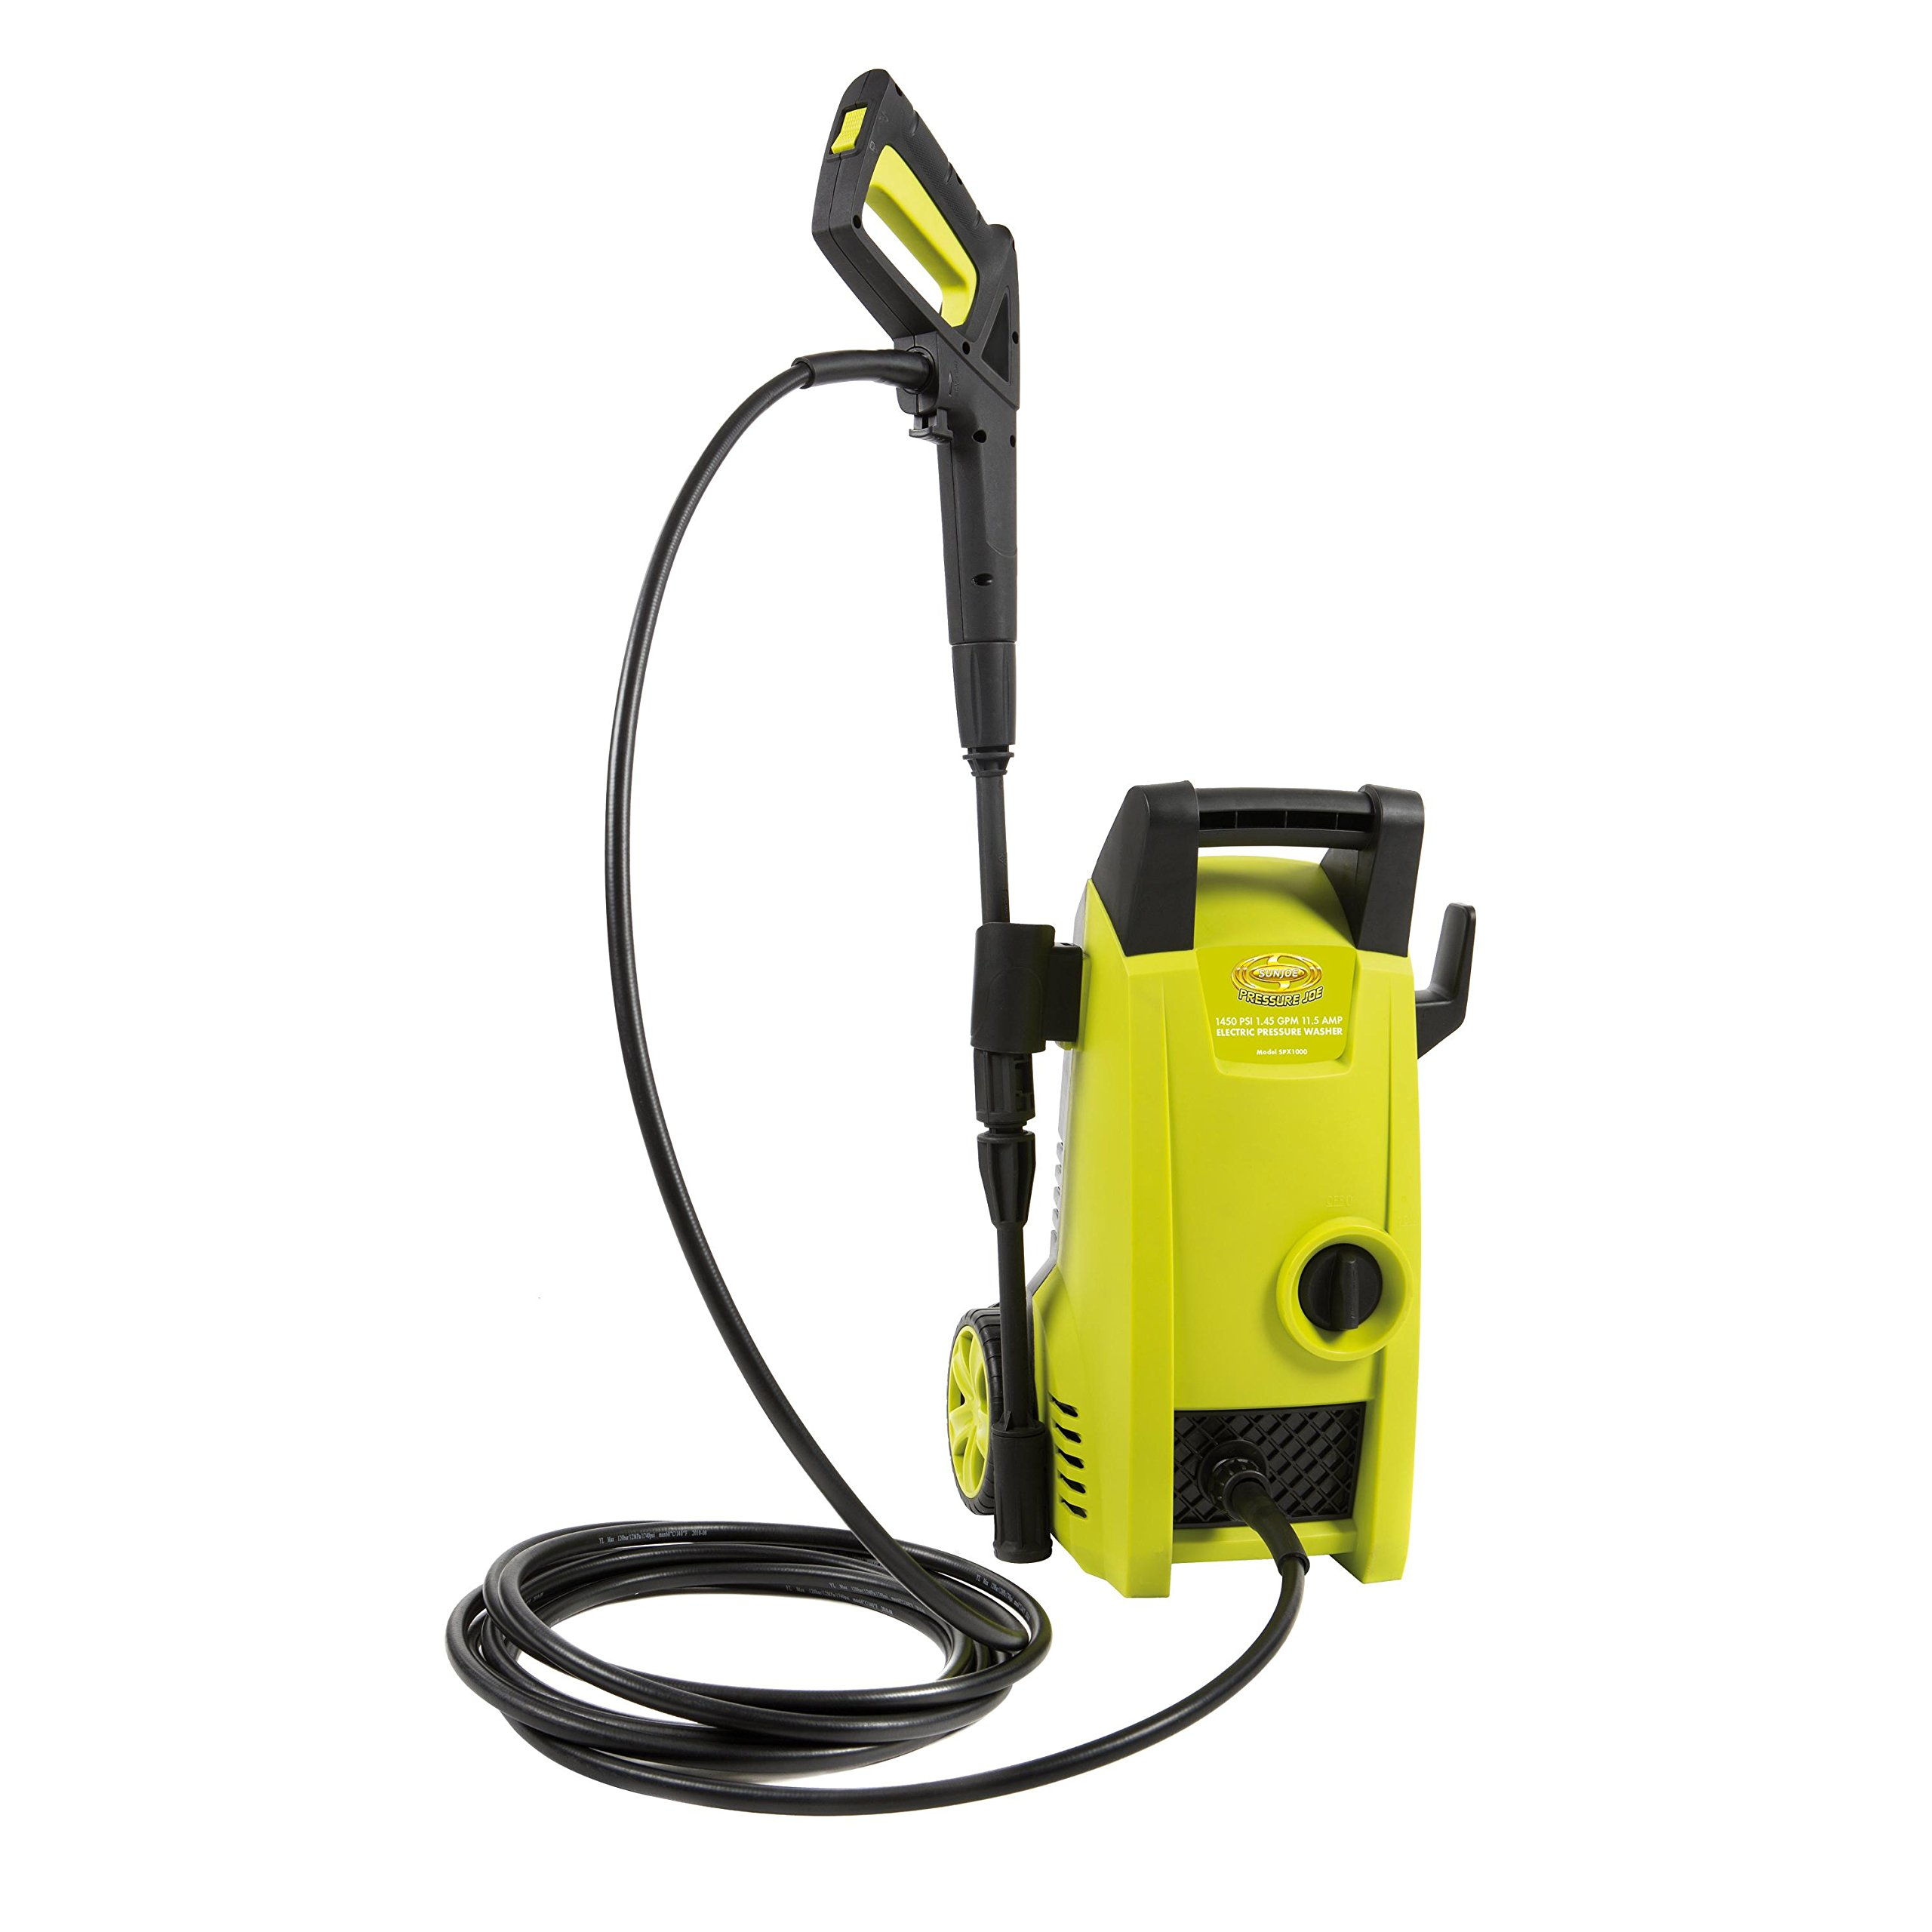 Sun Joe SPX1000-RM Pressure Joe 1450 PSI 1.45 GPM 11.5-Amp Electric Pressure Washer